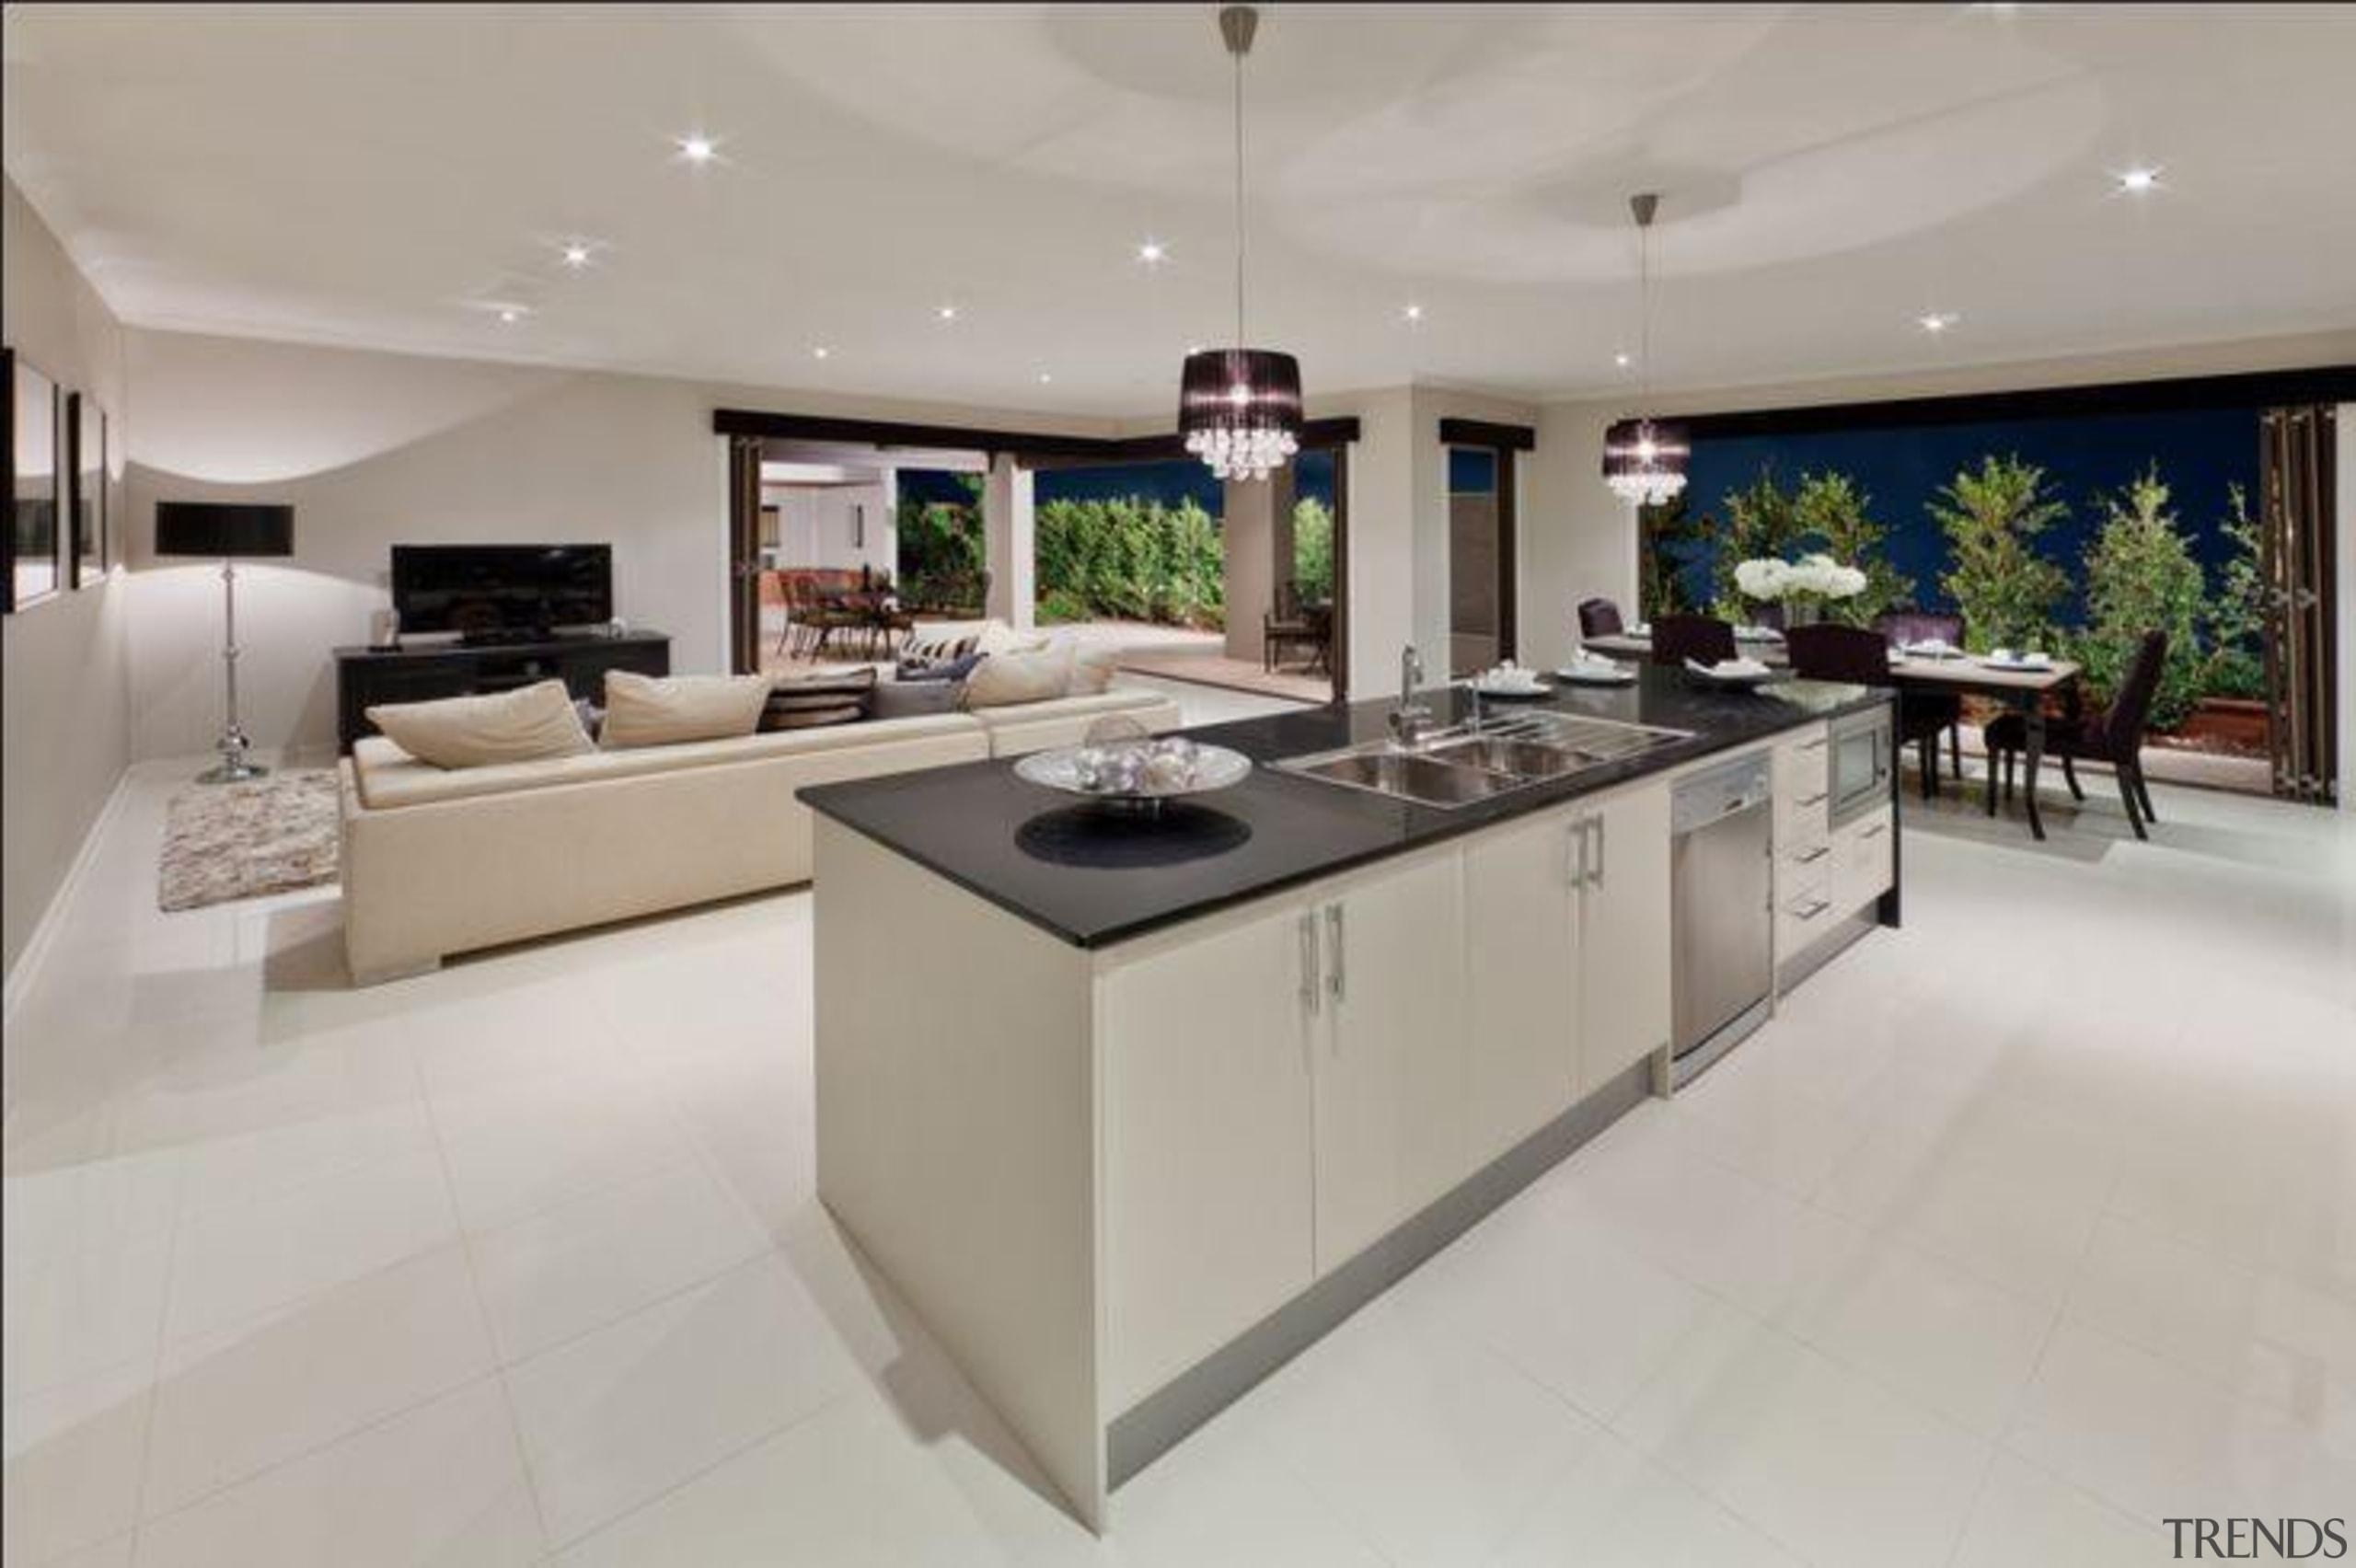 Metricon Homes Jet Black - Jet Black™ - countertop, floor, interior design, kitchen, property, real estate, gray